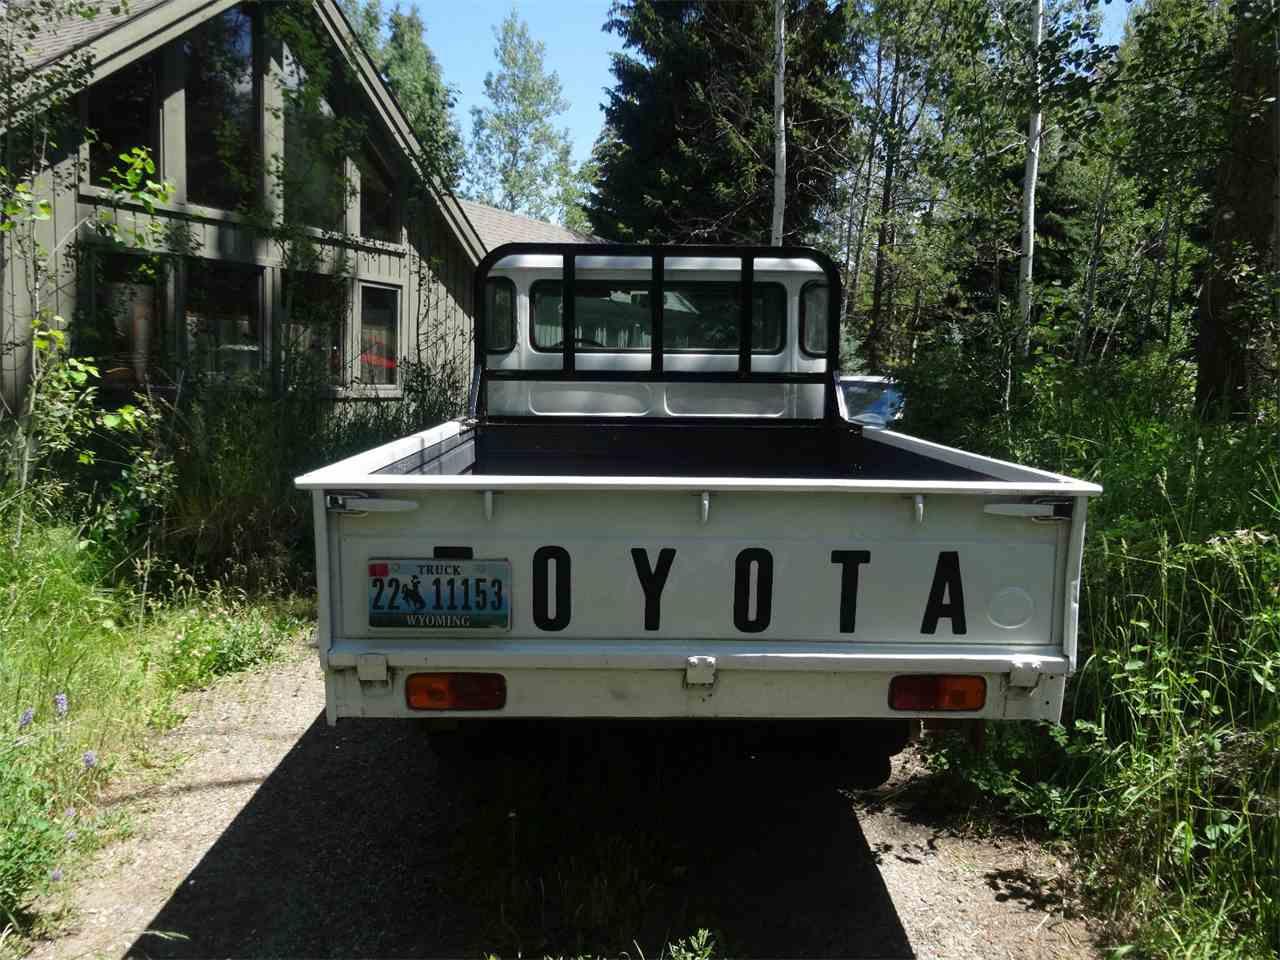 1097754-1968-toyota-land-cruiser-fj45-std-c.jpg